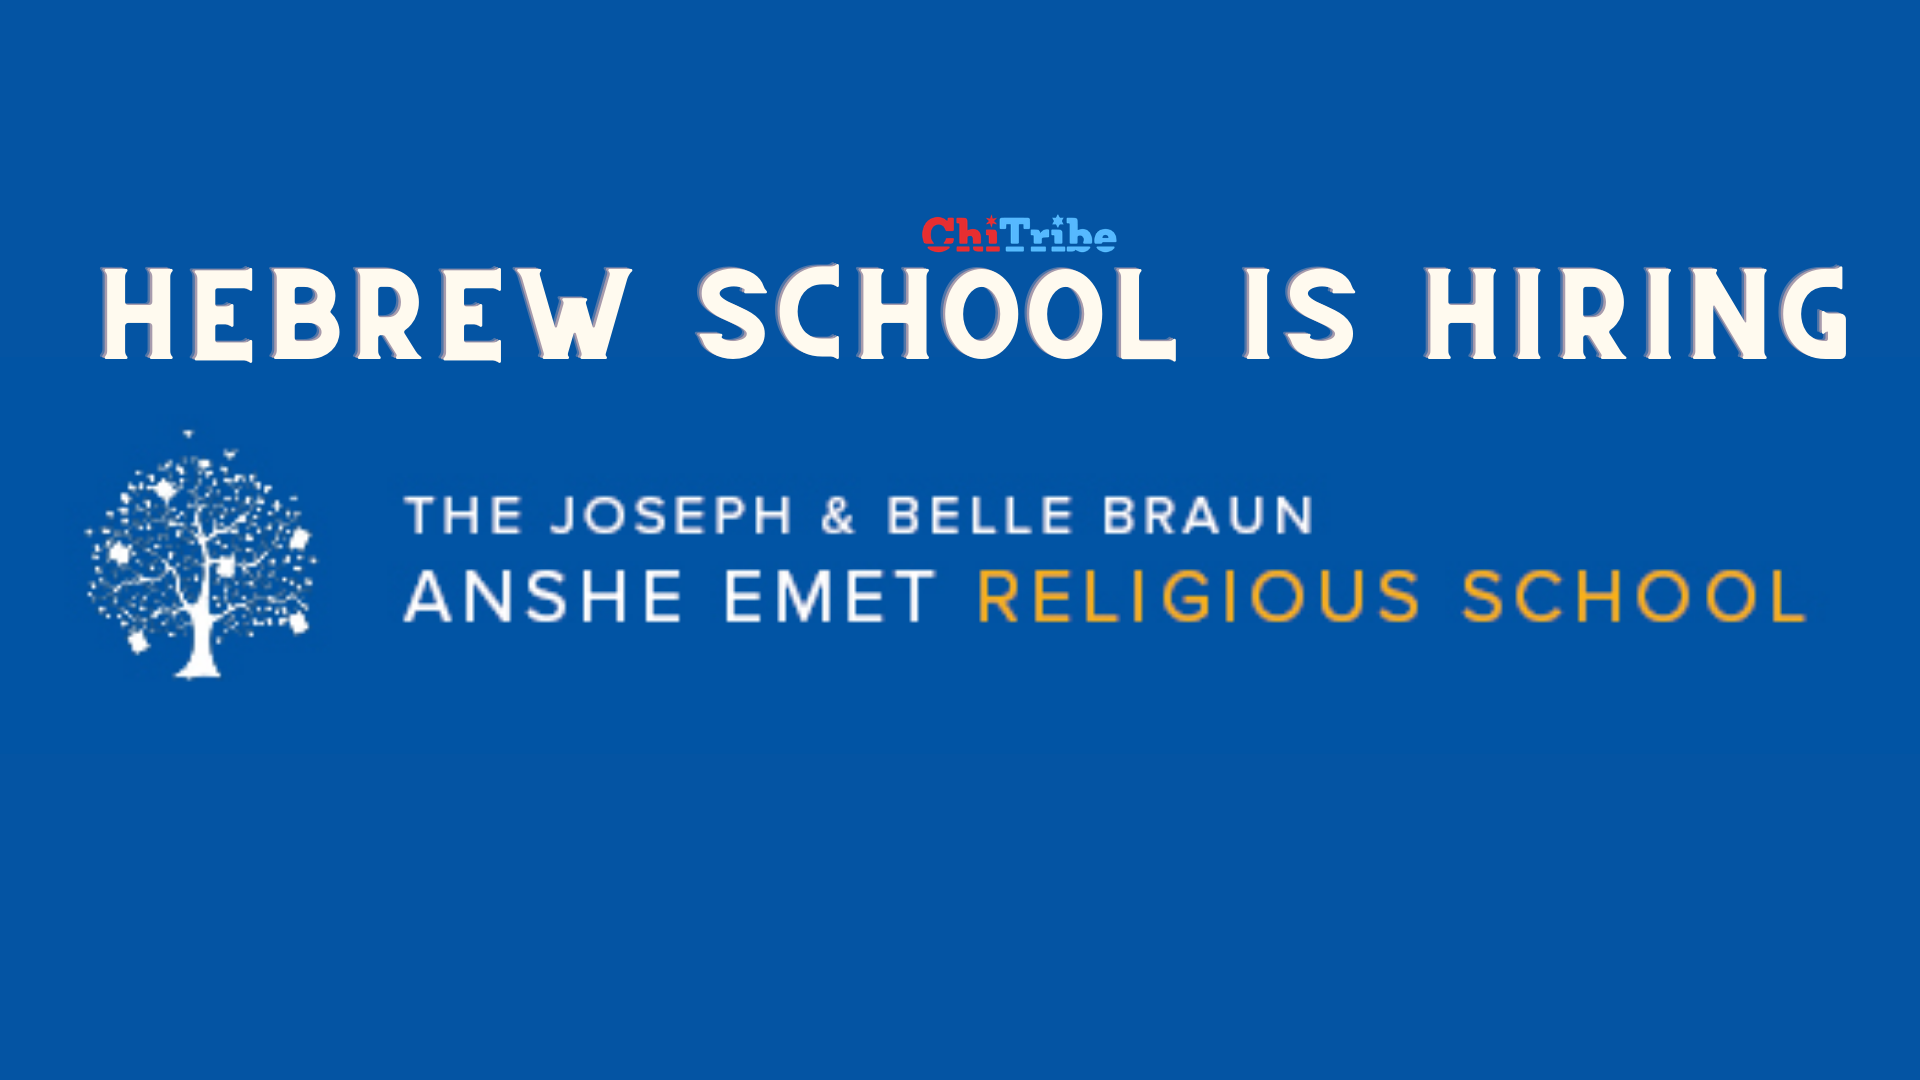 anshe emet hebrew school hiring chitribe